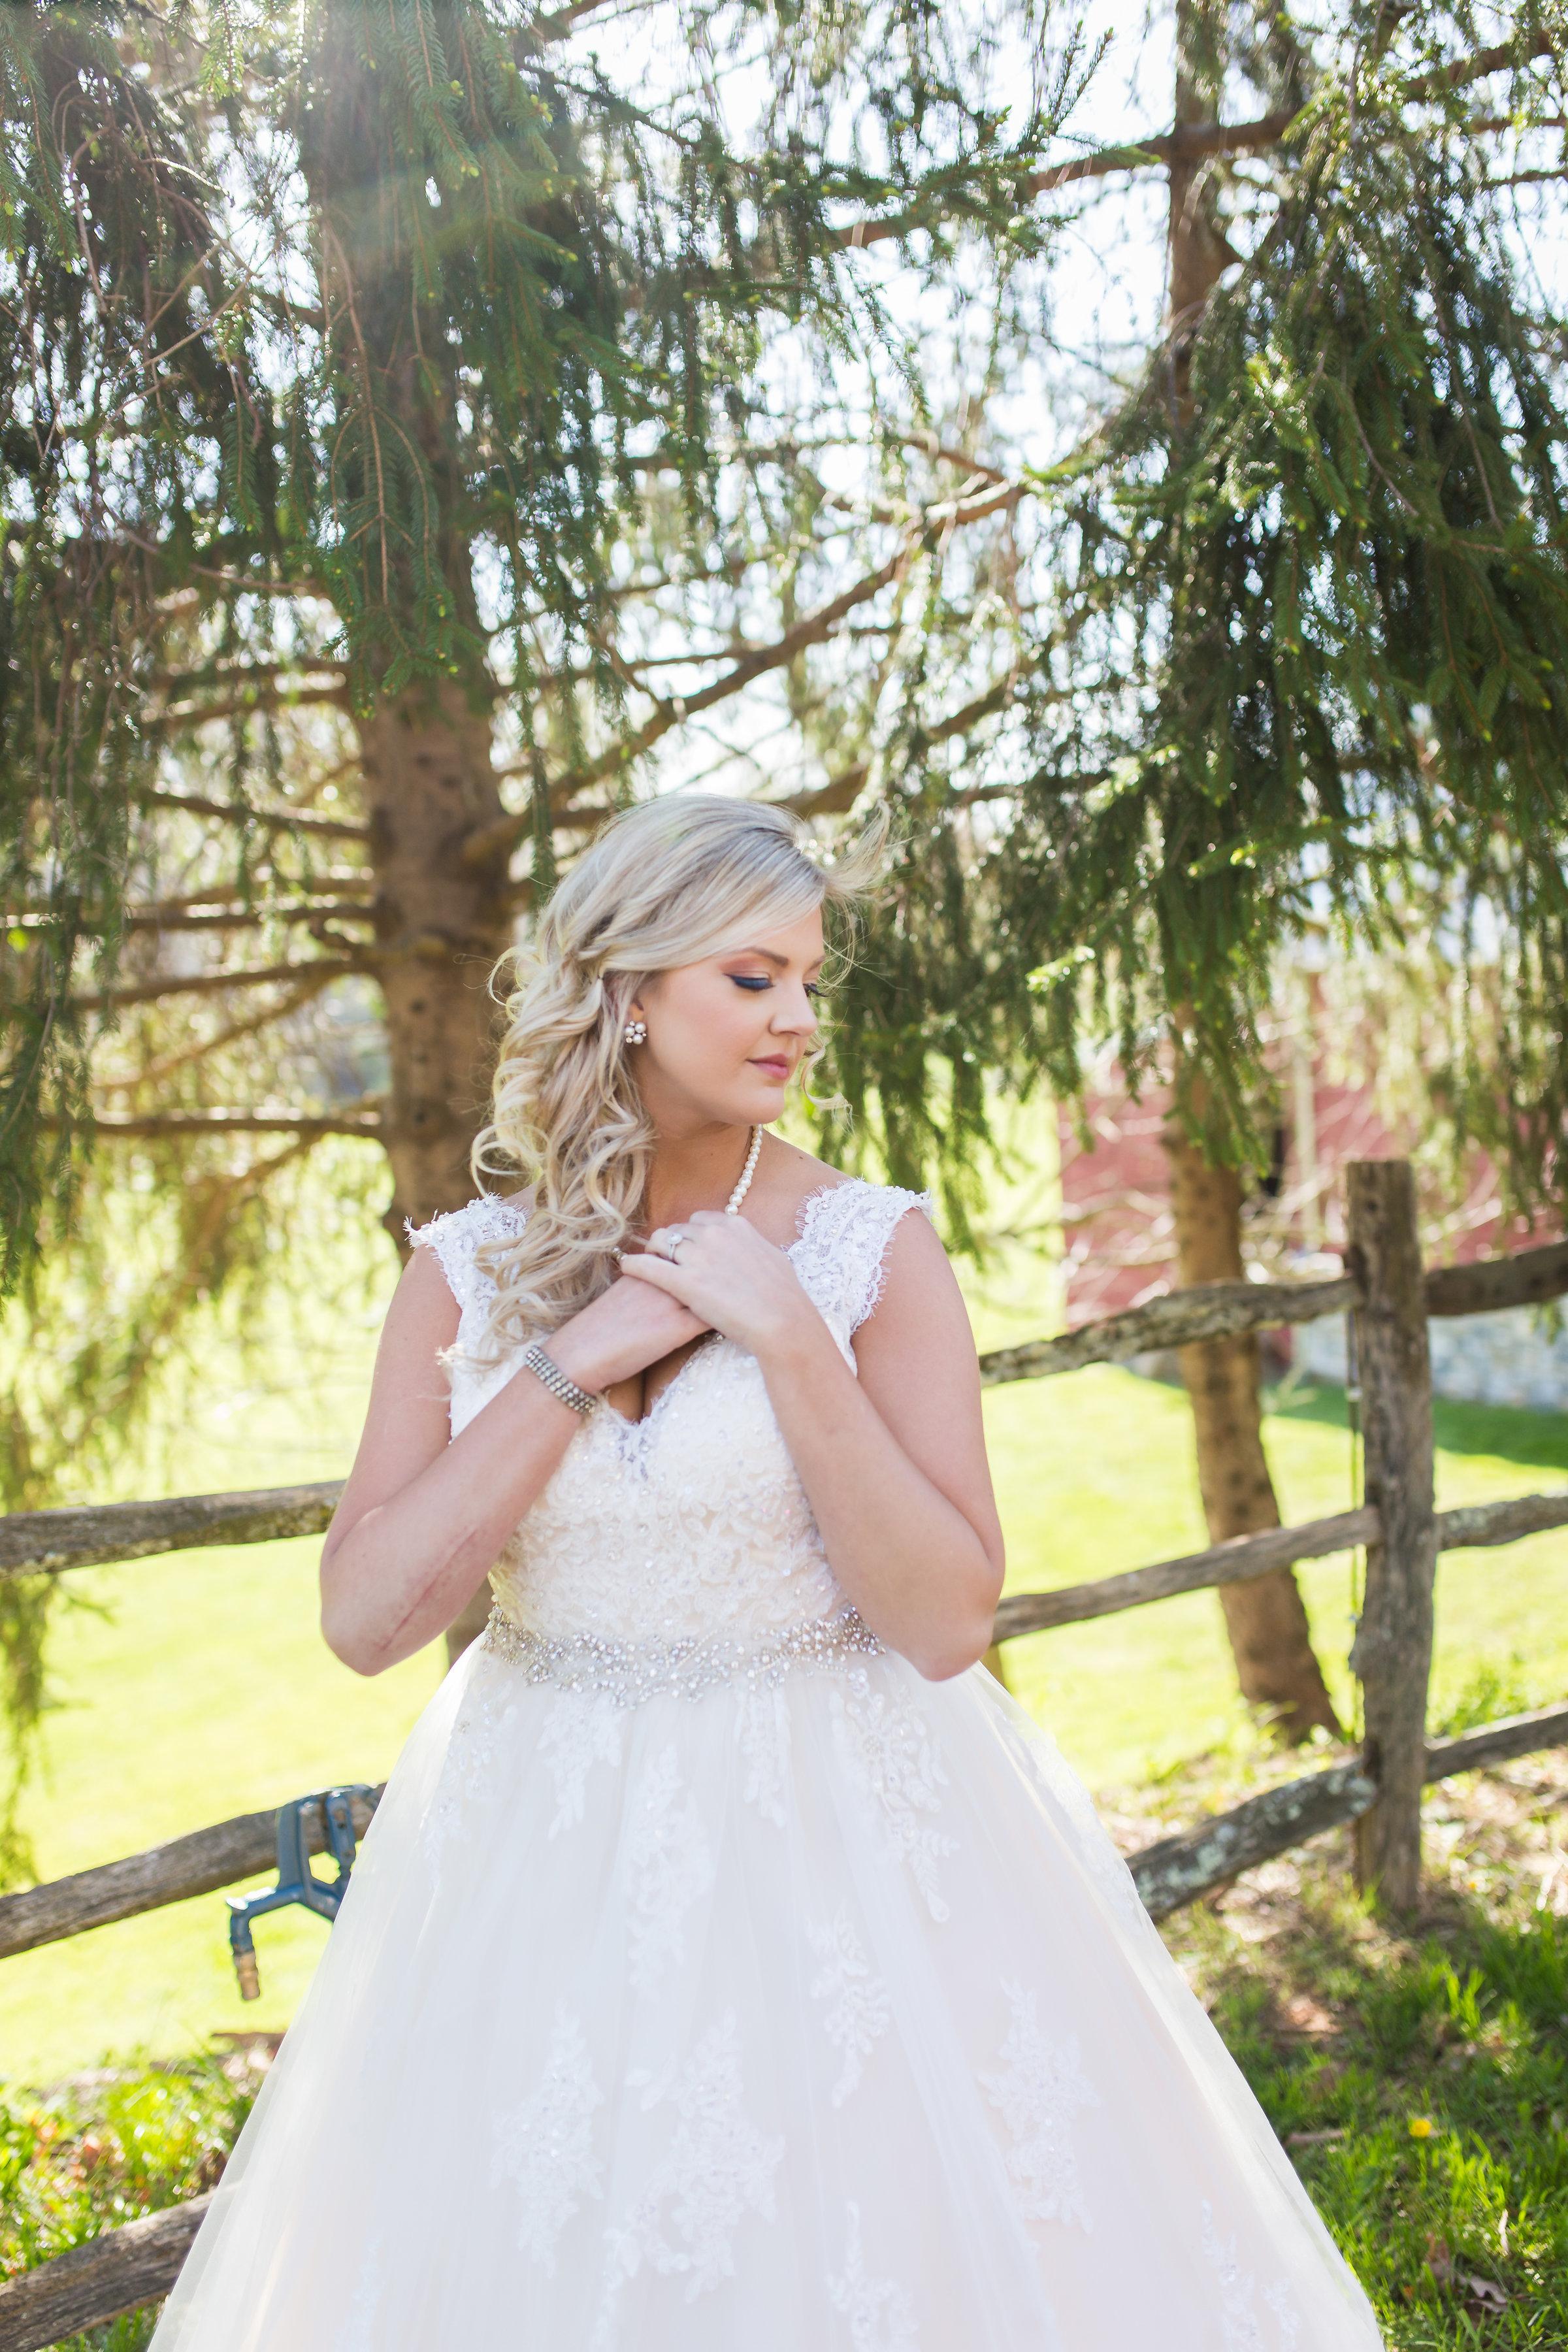 Honeysuckle-Hill-Asheville-Wedding-Venue-Ann-Cordell-Bridal-21.JPG